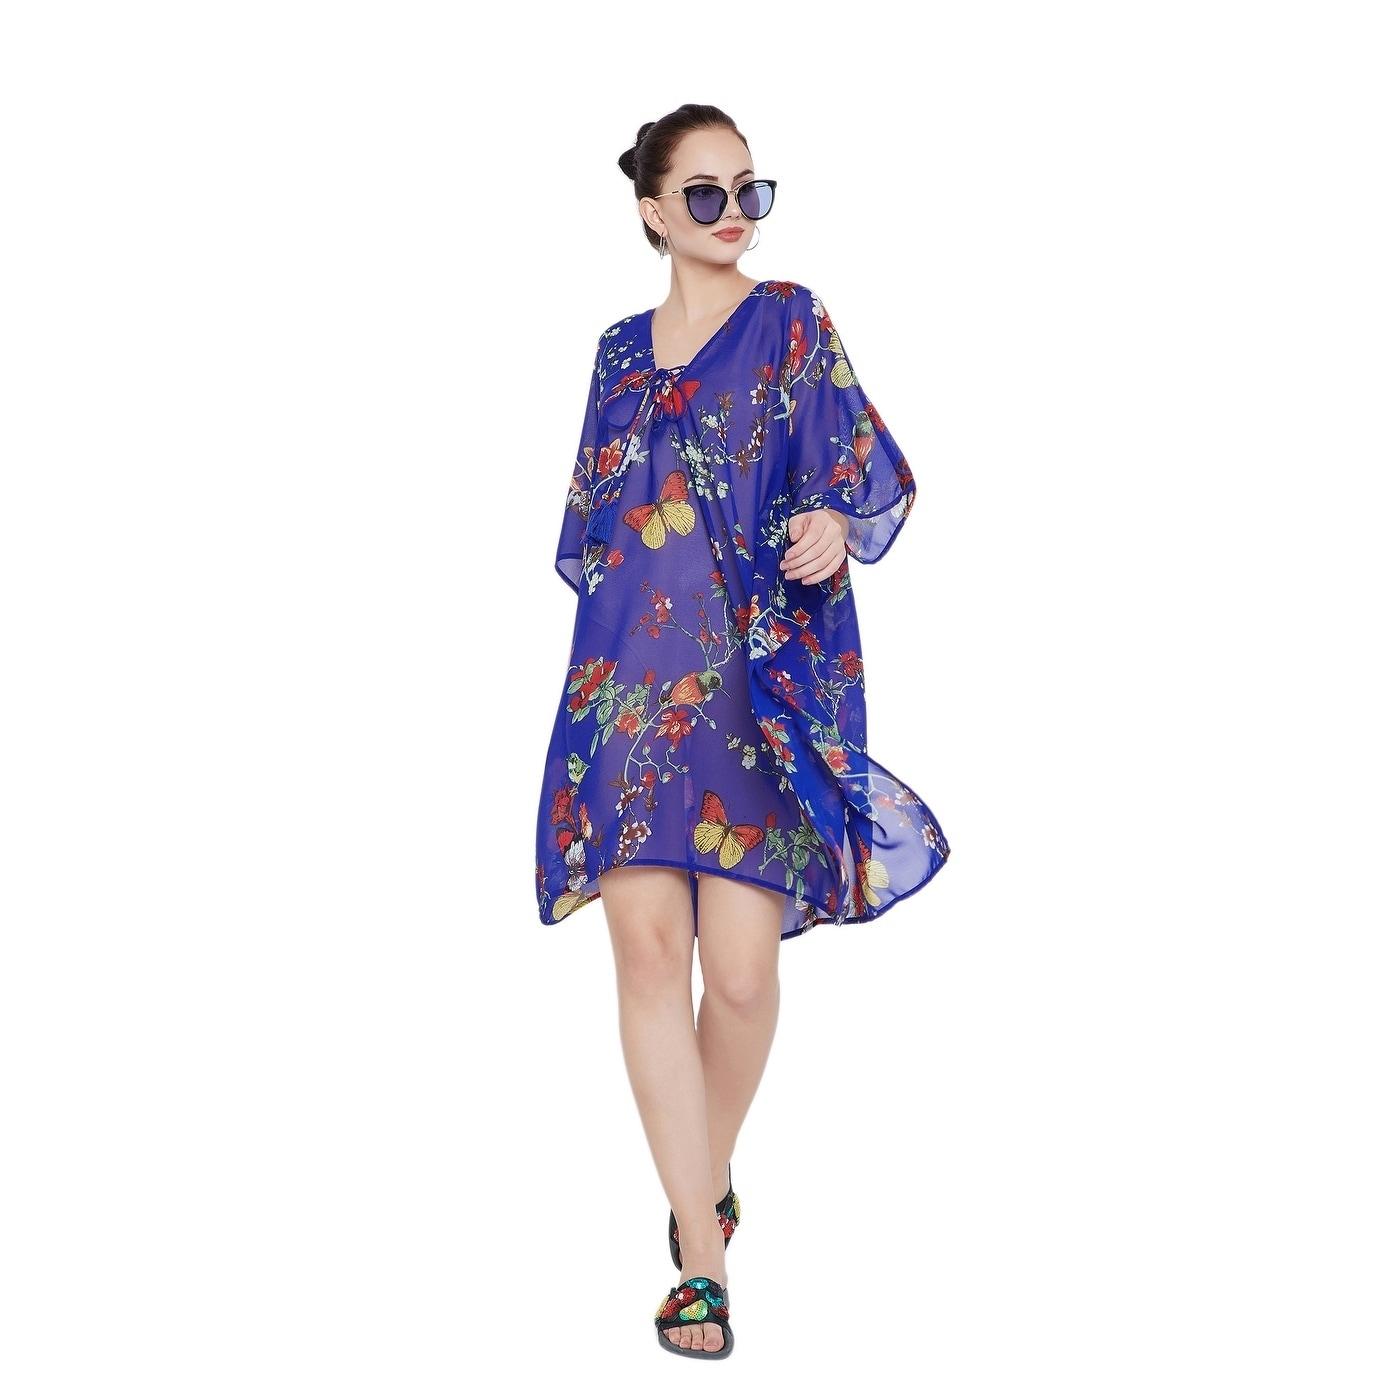 1f5b214984780 Shop Royal Blue Floral Tassel Beach Dress Bikini Cover Up Women Bathingsuit  - Free Shipping Today - Overstock - 23092062